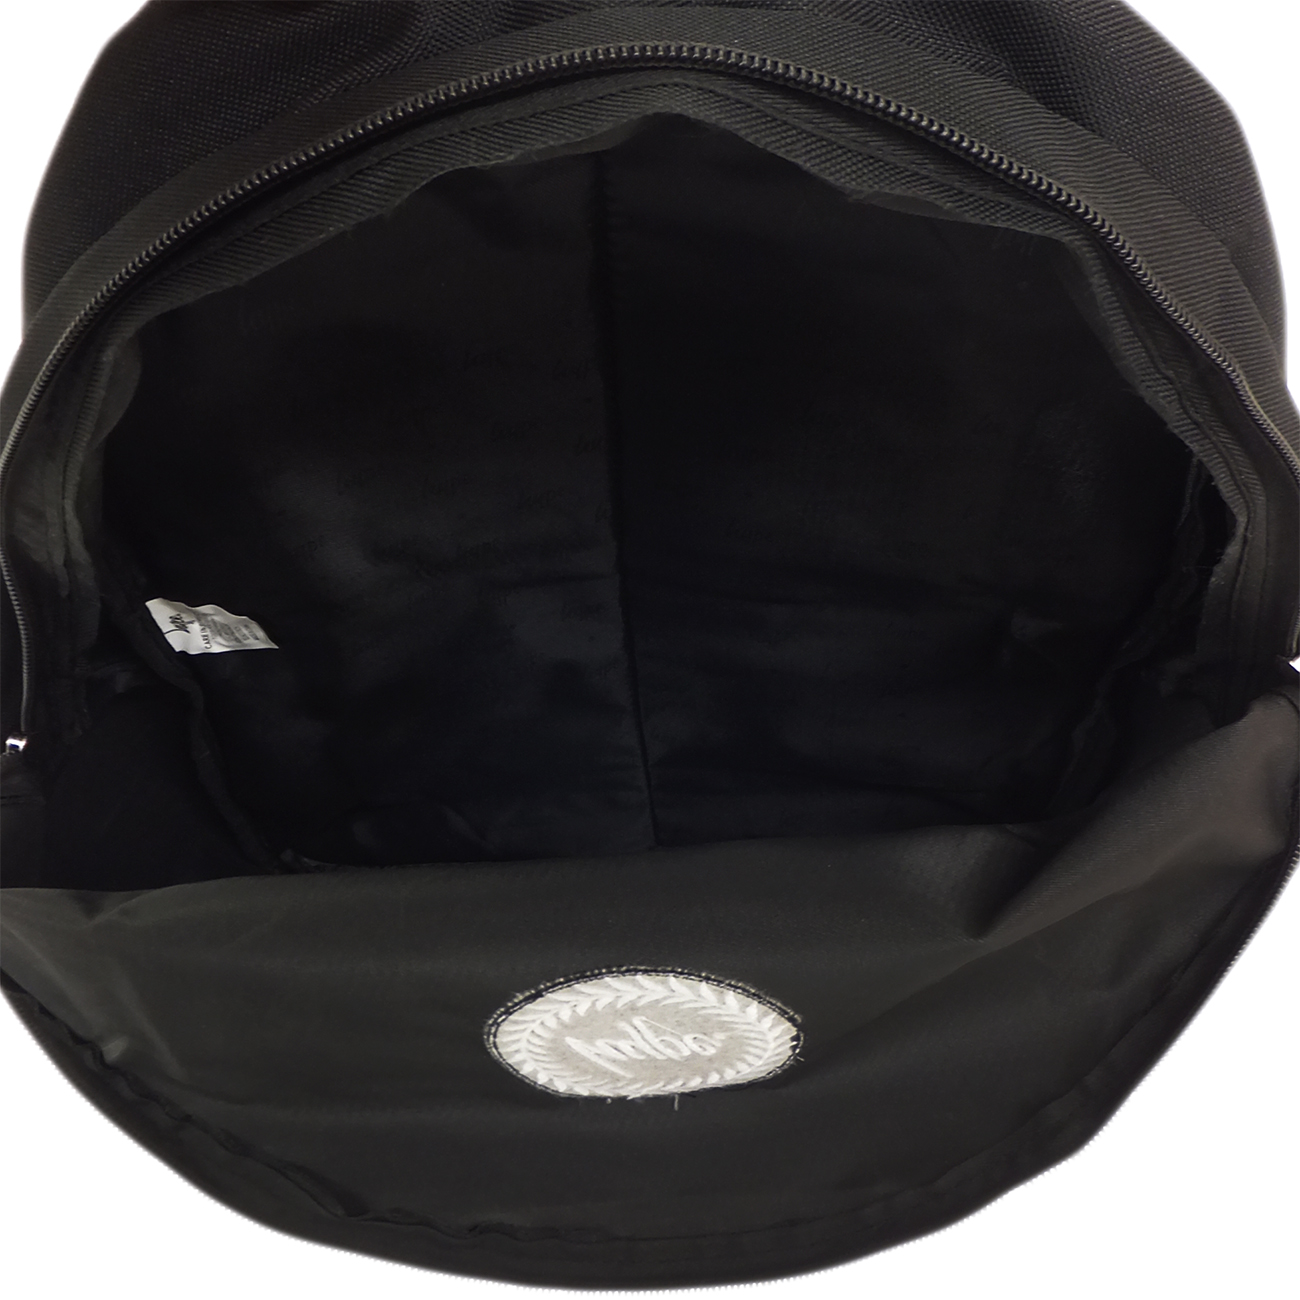 Unisexe-Hype-Sac-A-Dos-Ecole-Gym-SACS-pochettes-pencil-case miniature 148